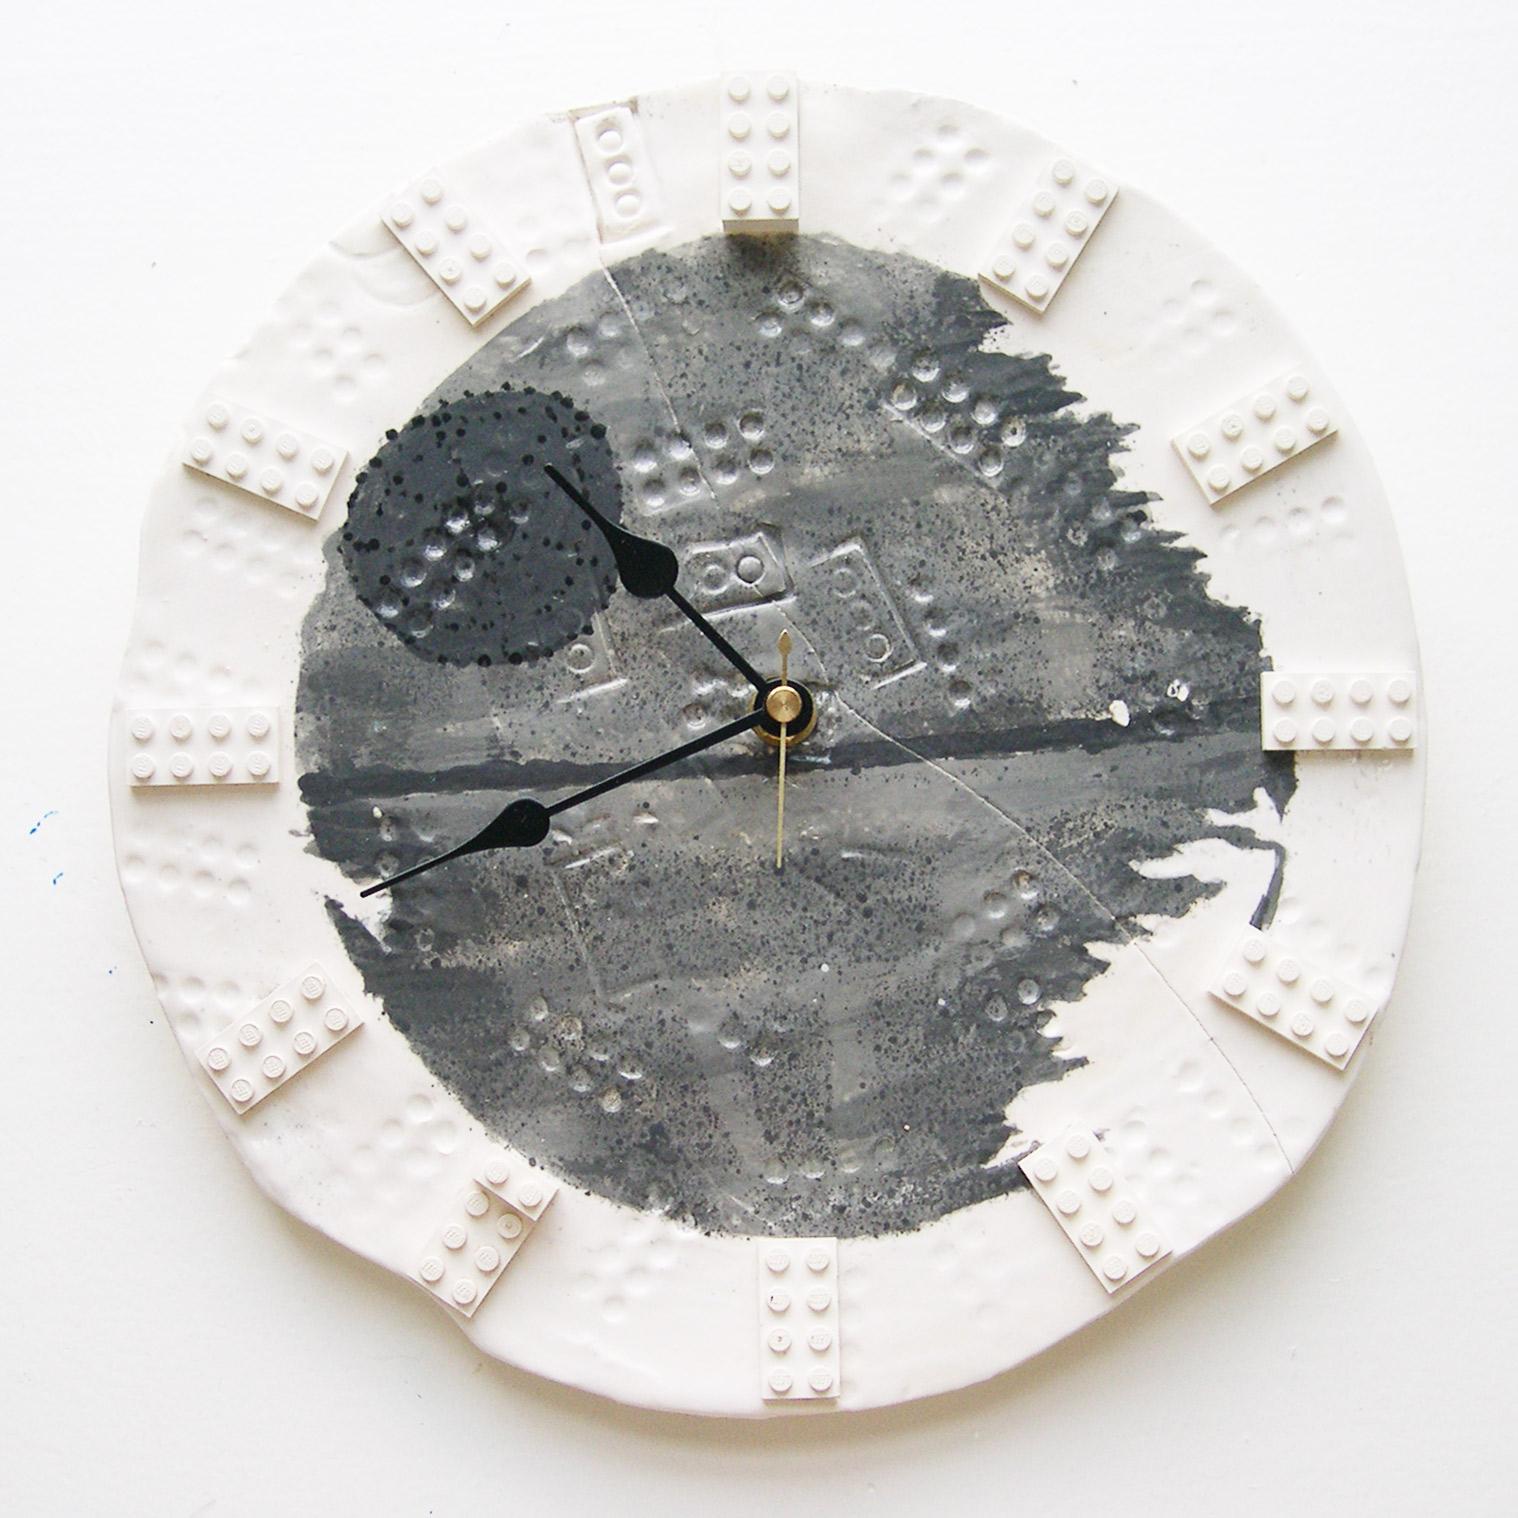 cam-clock-6-web.jpg